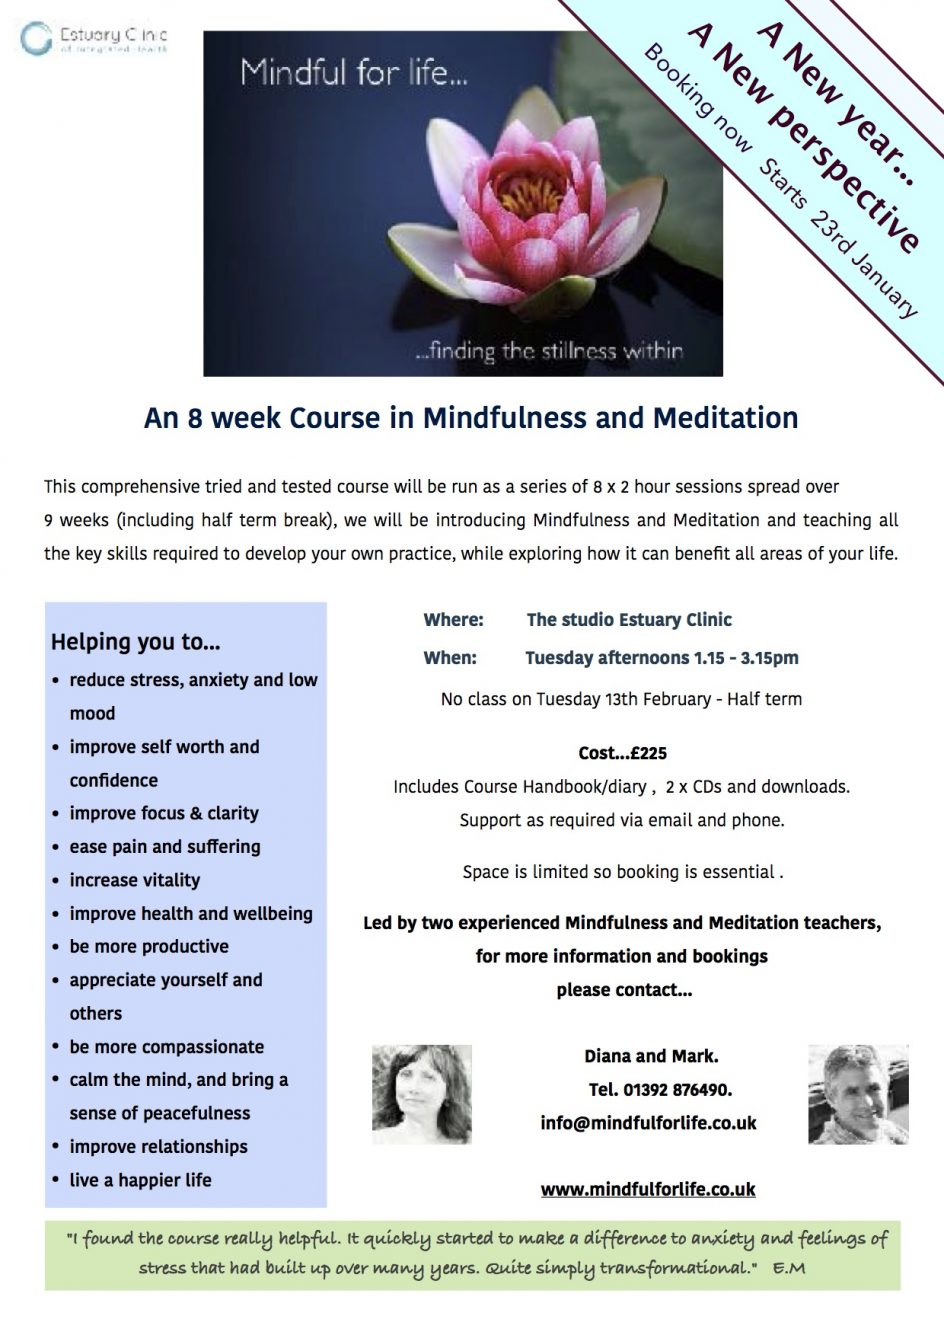 Mindfulness & meditation course